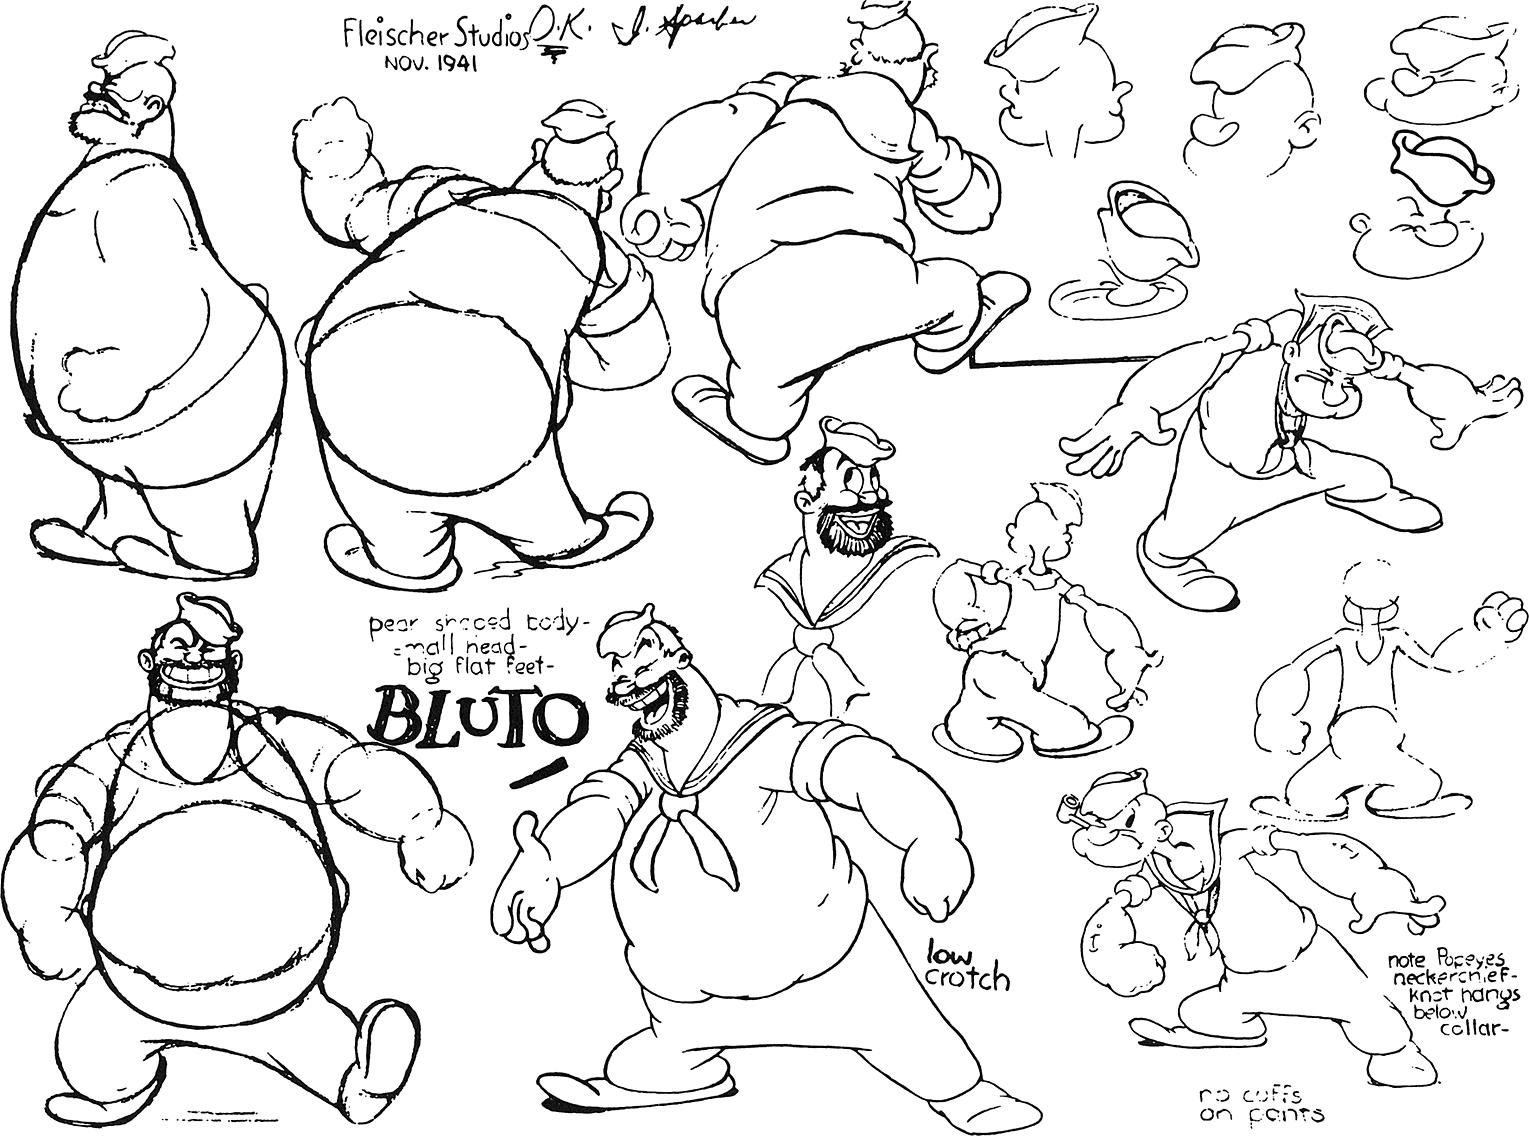 1529x1136 Bluto Model Sheets From Fleisher Studios Cartoons